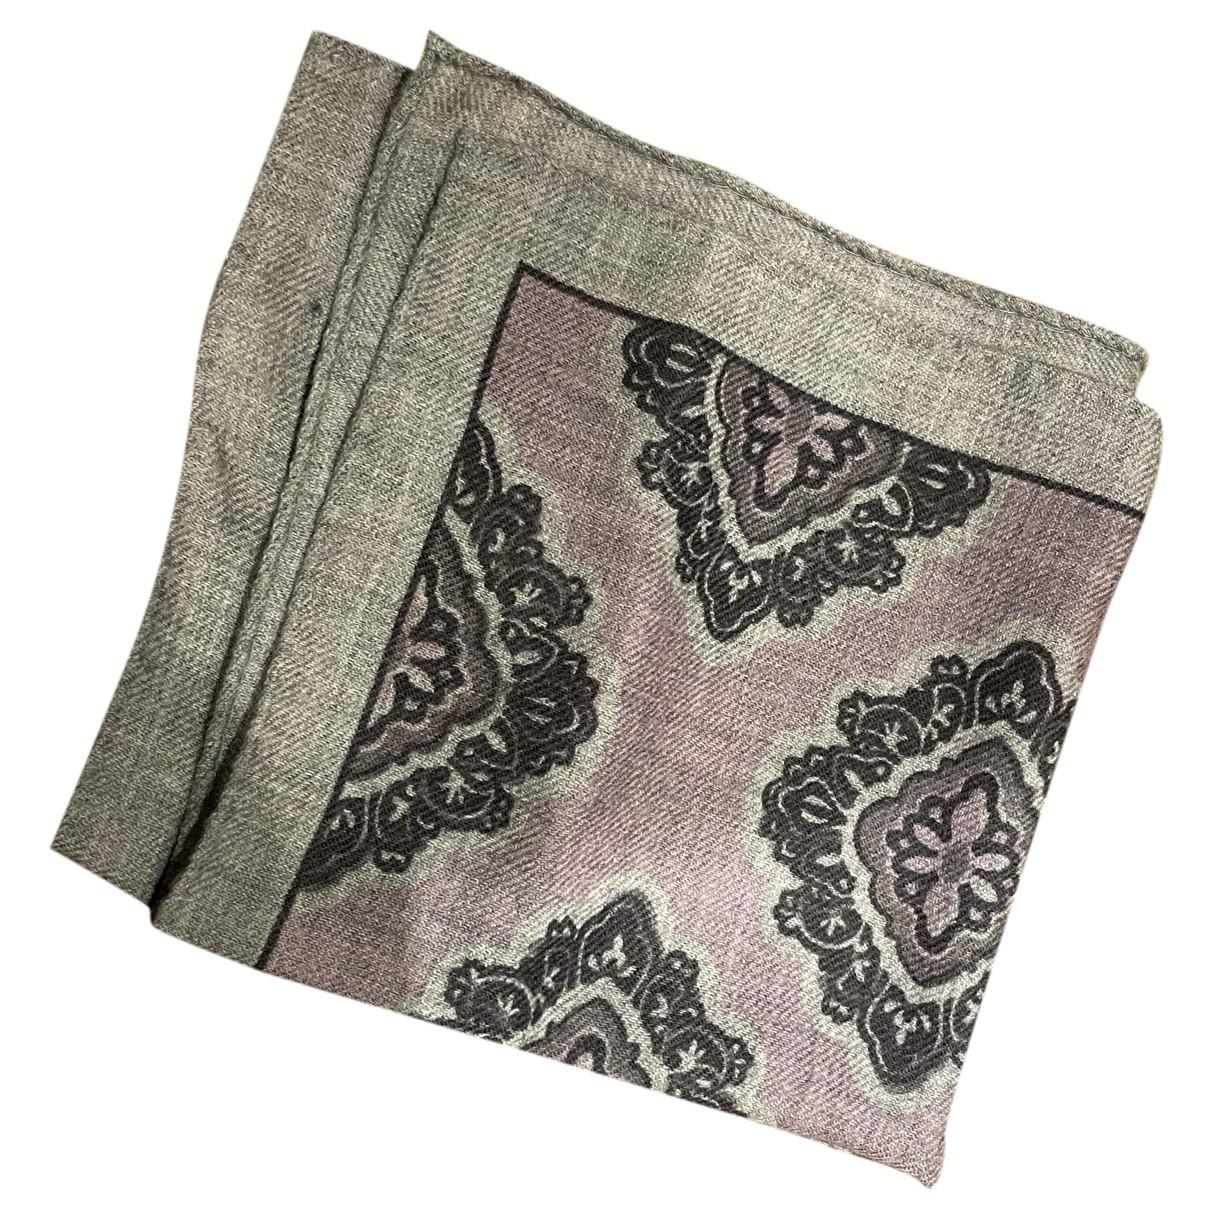 Suitsupply - Cheches.Echarpes   pour homme en laine